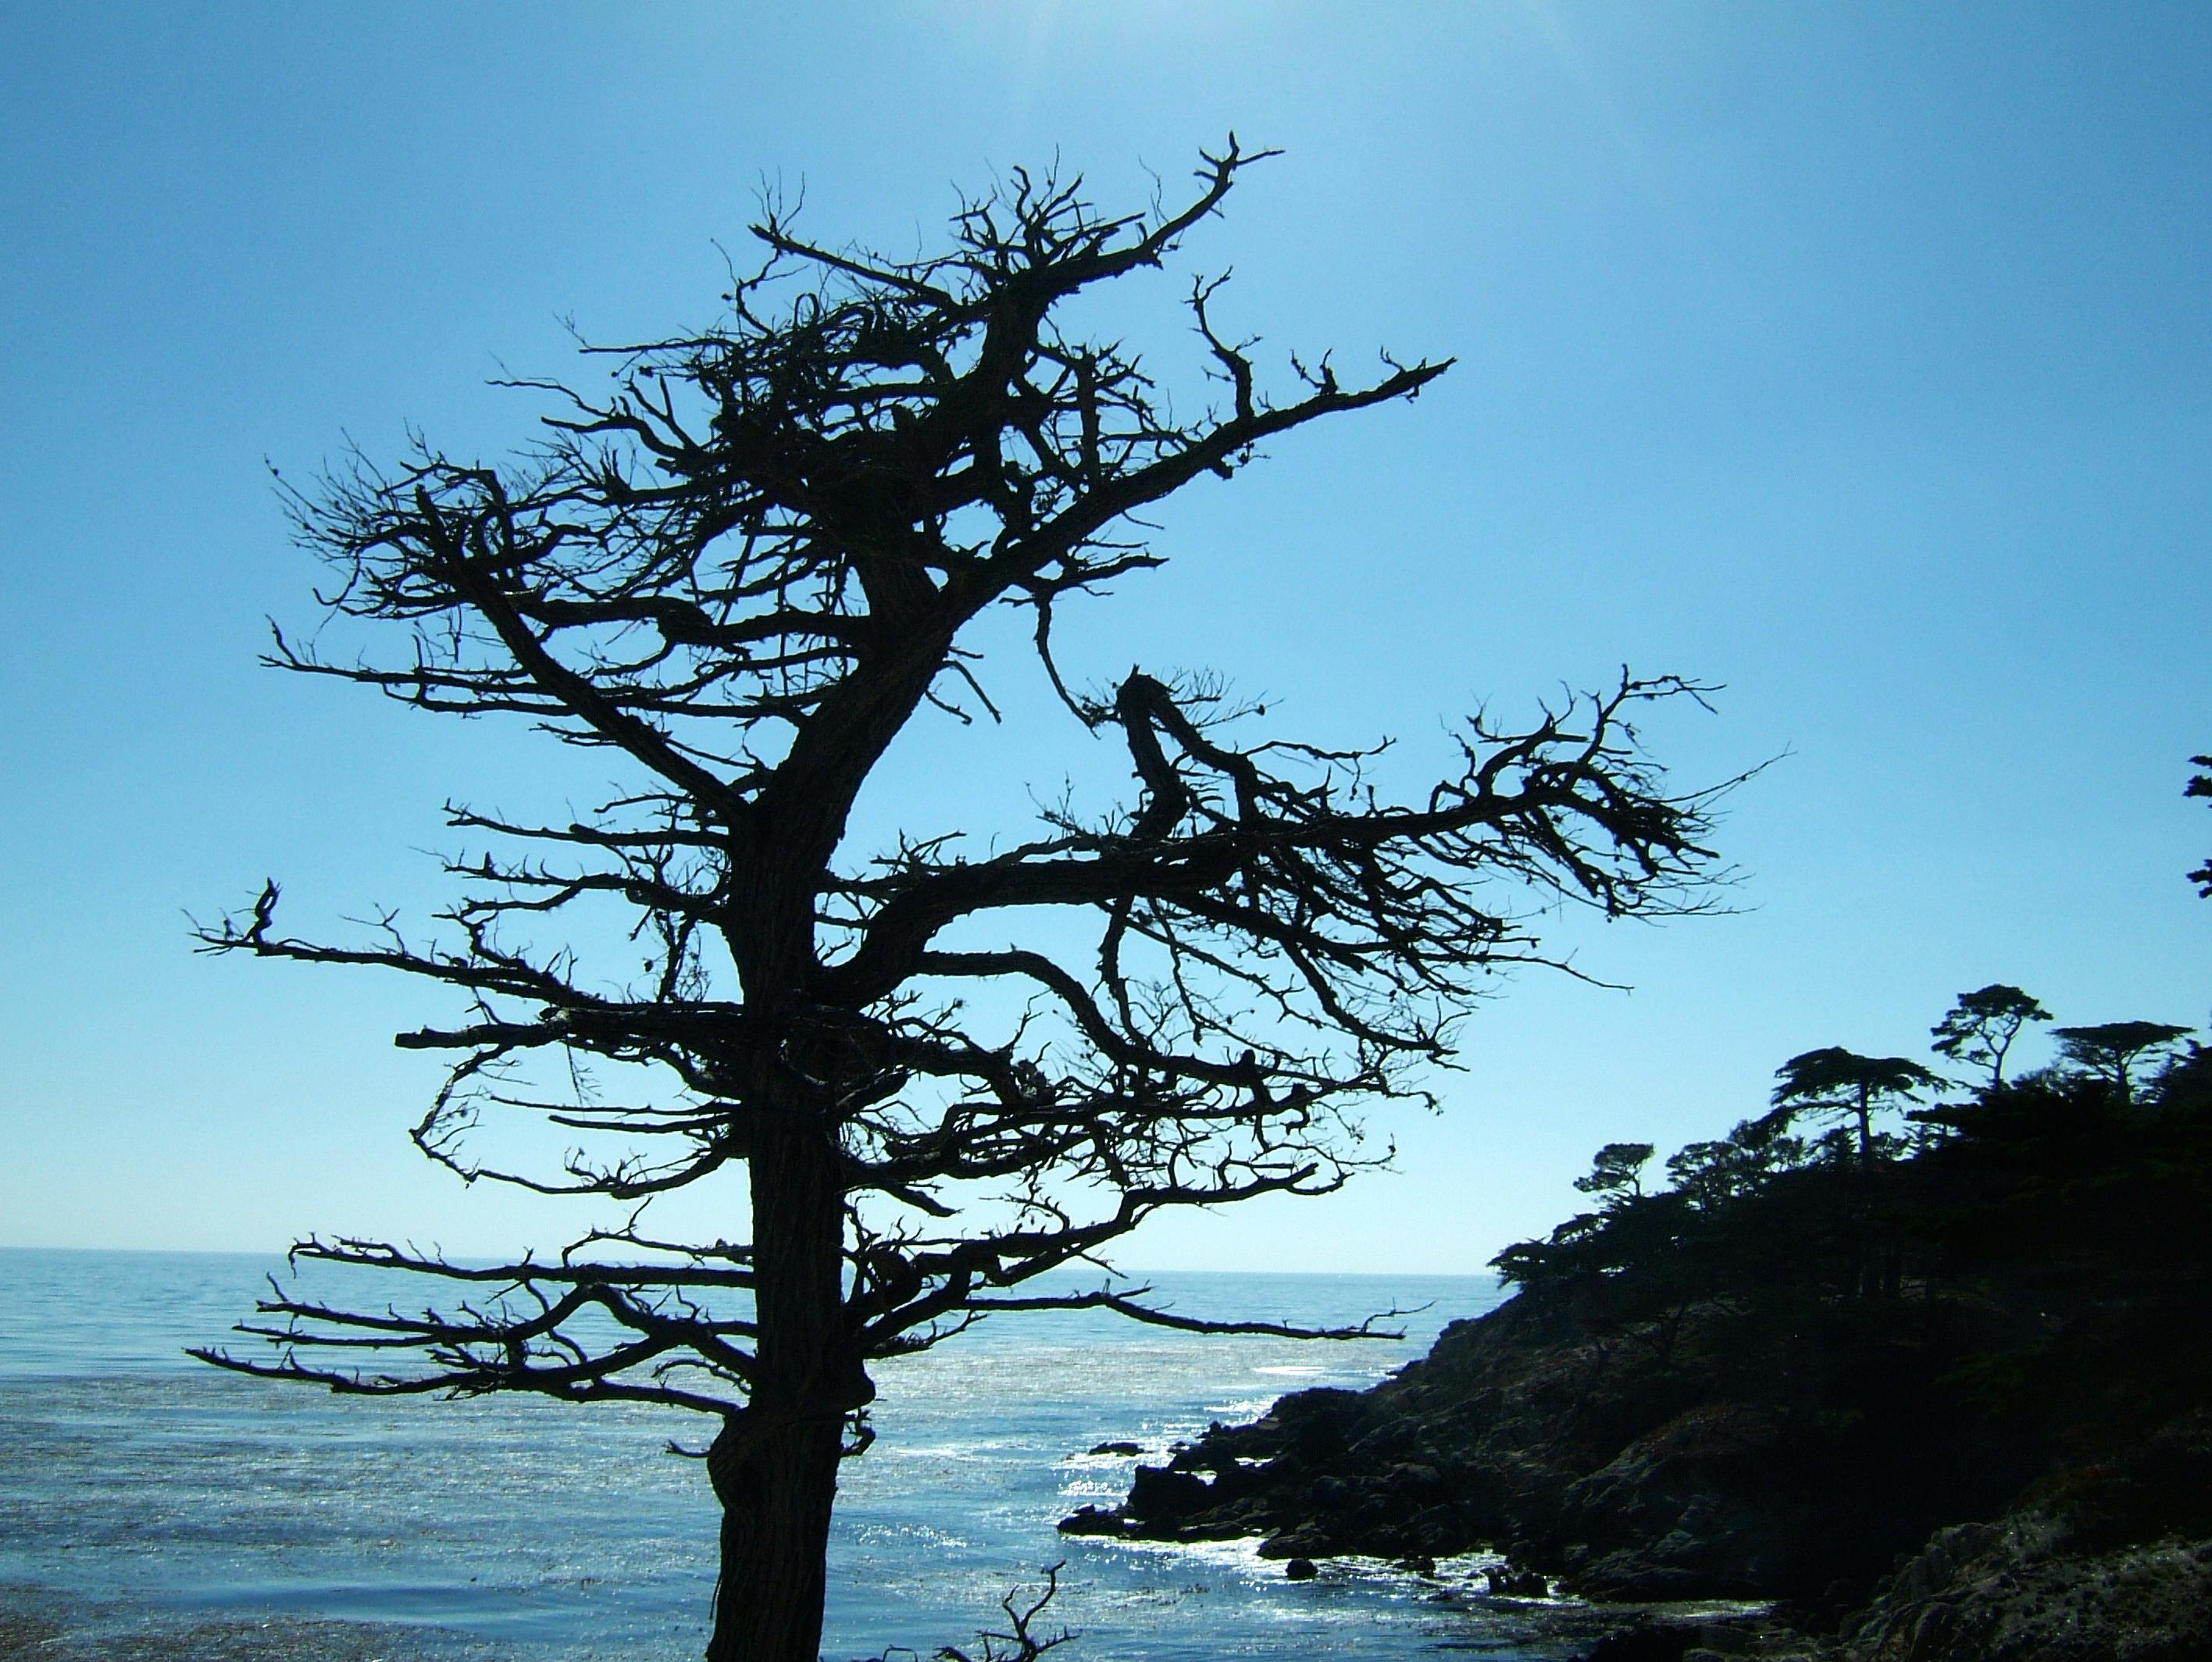 Tree USA California Monterey Pebble Beach 09